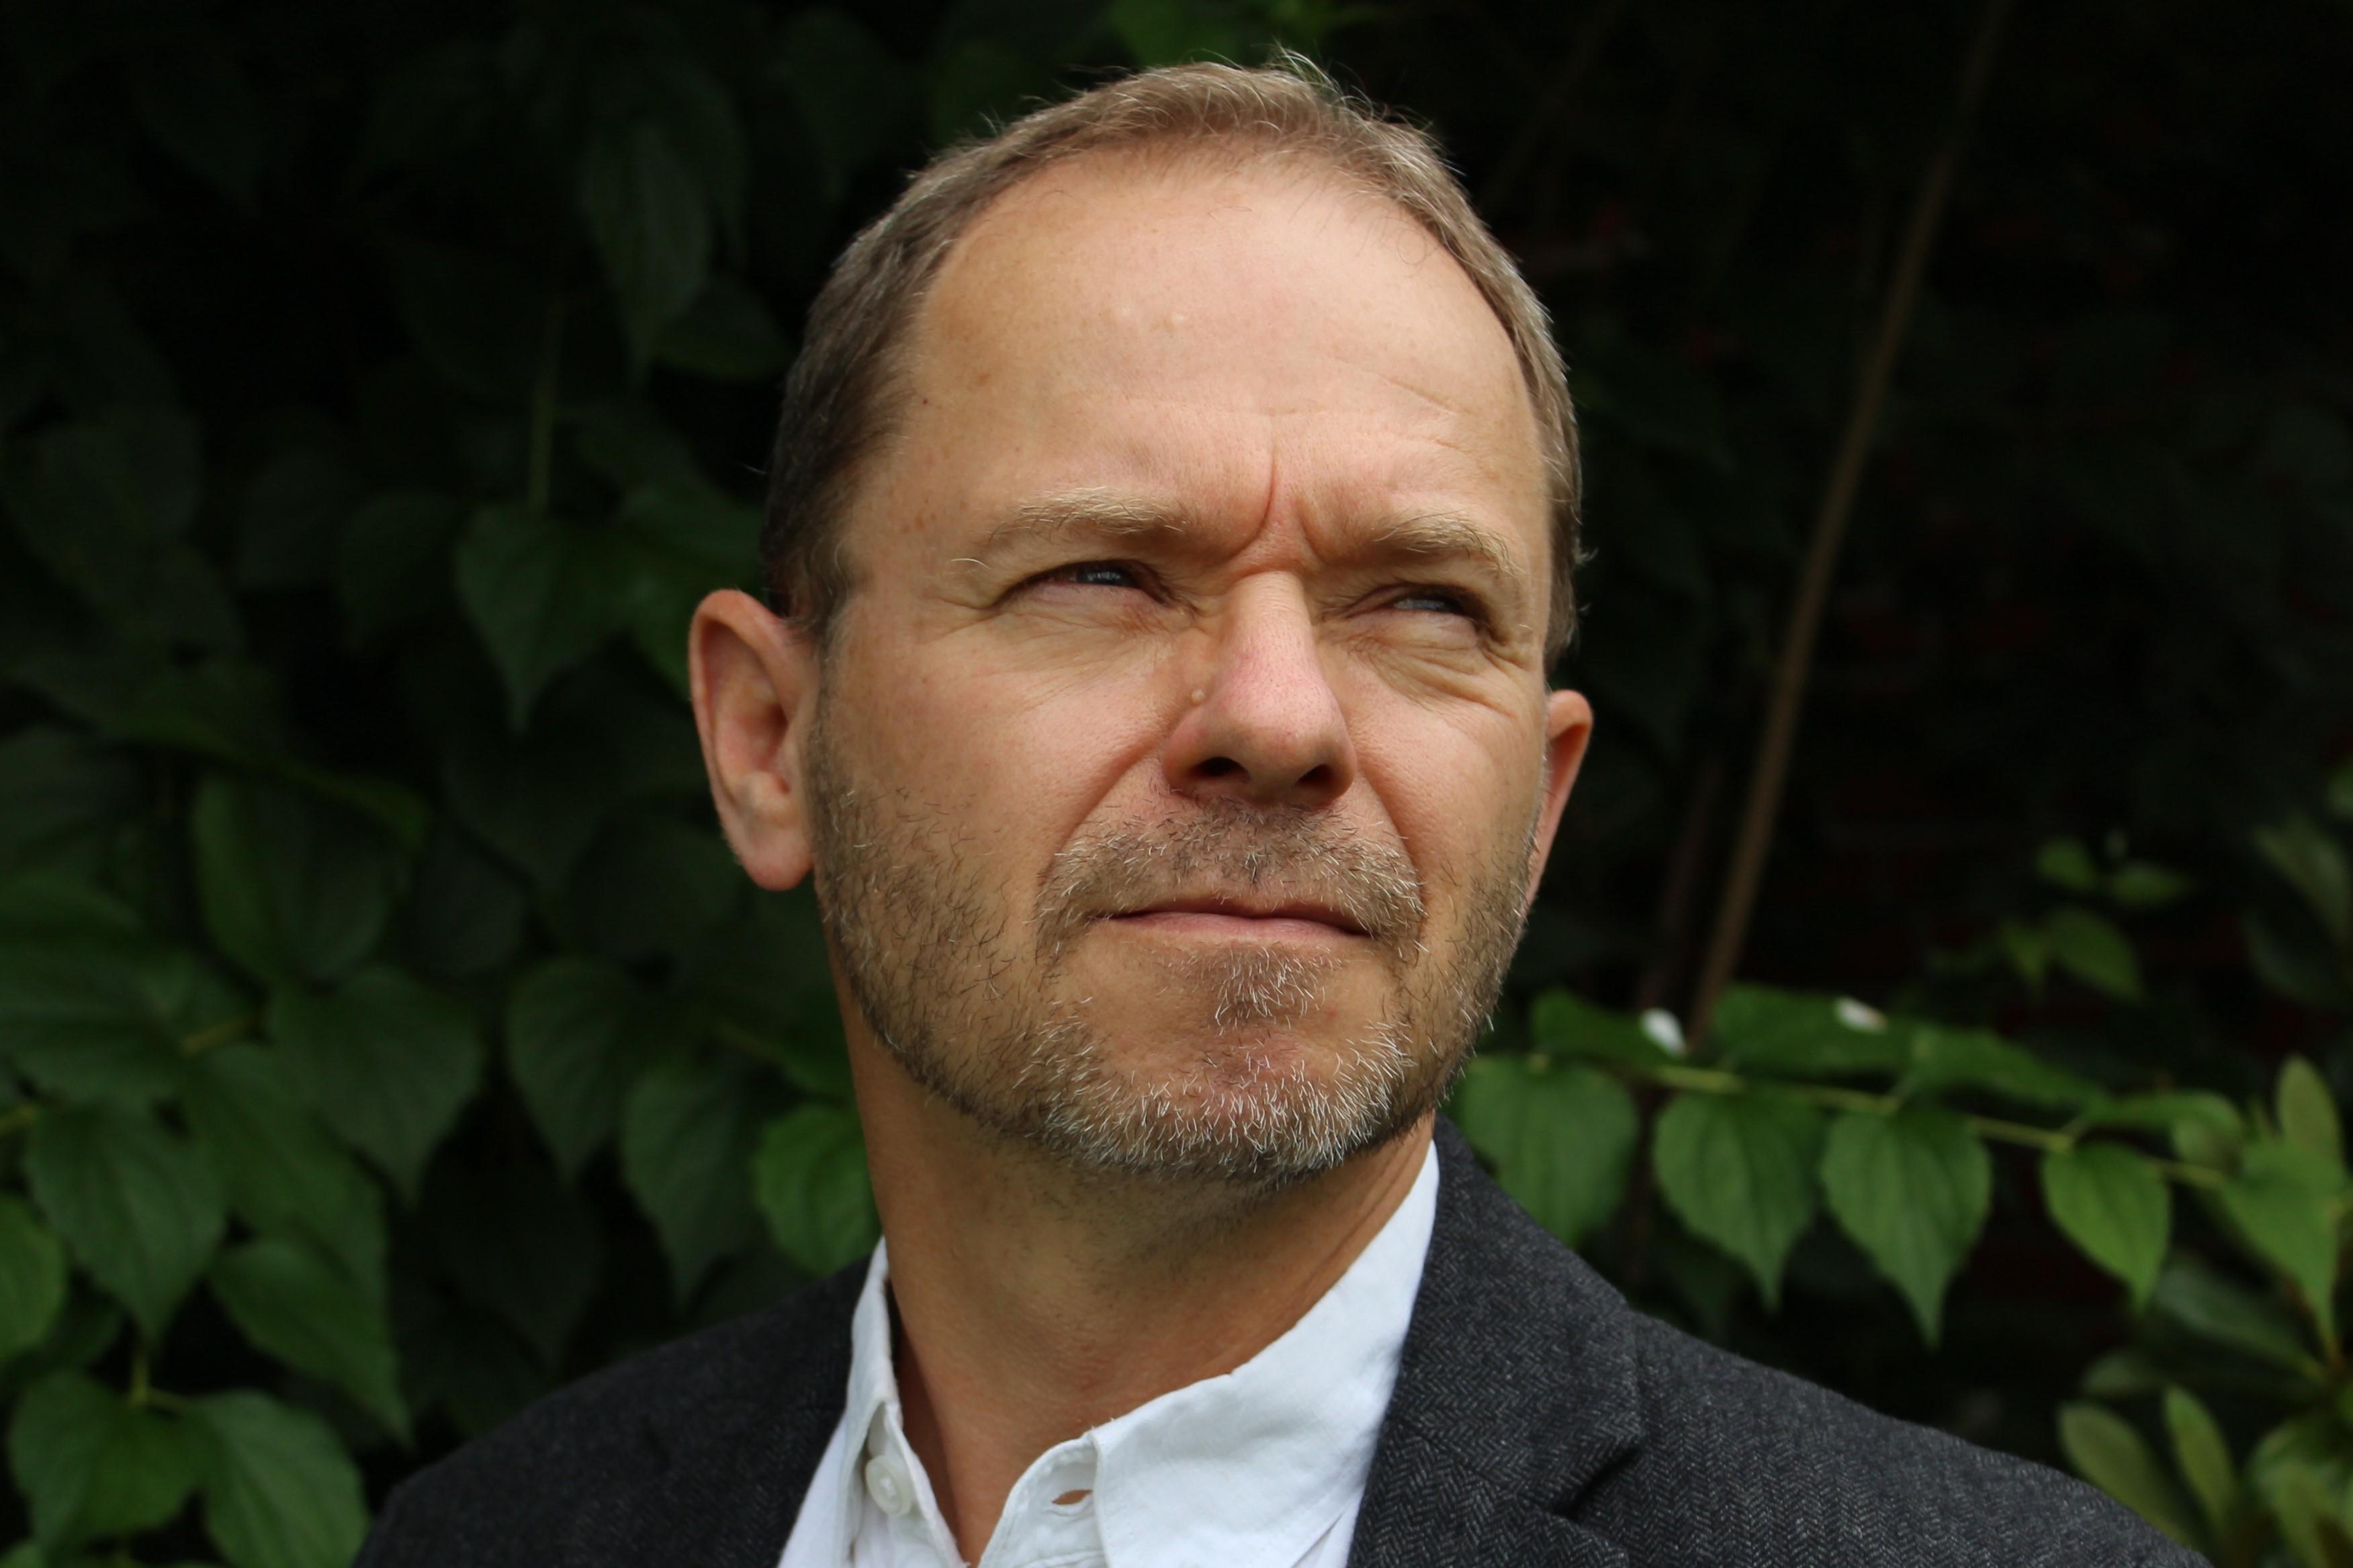 Klaus Enghvidt Olsen